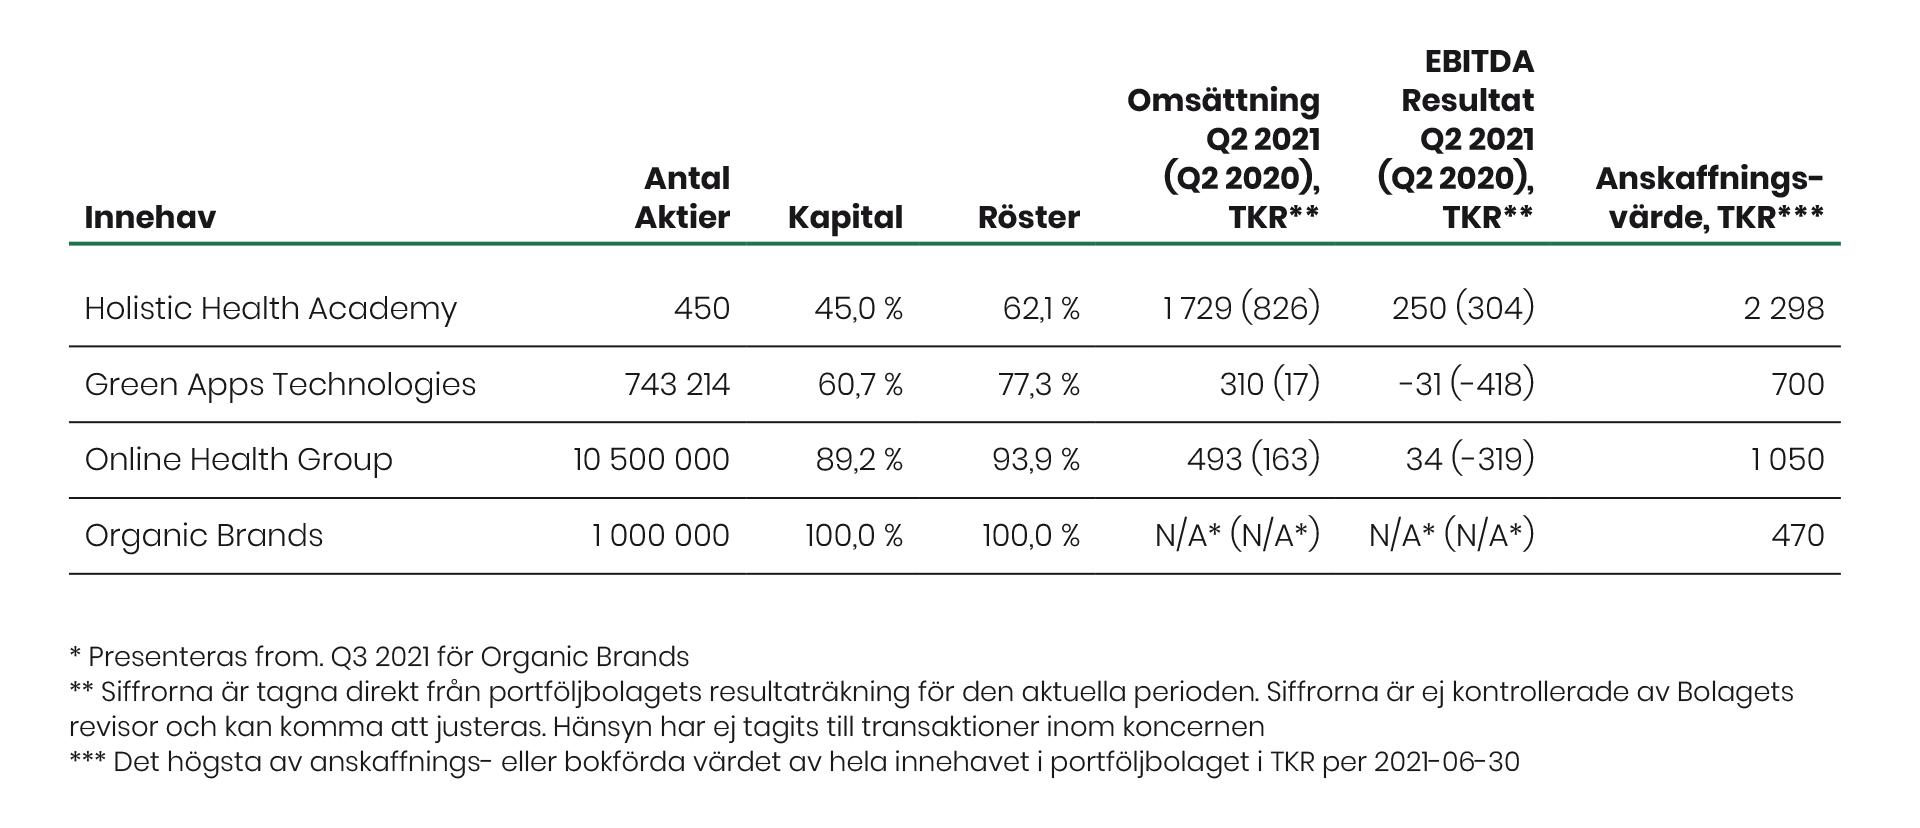 NOSIUM Aktieportfölj Q2 2021